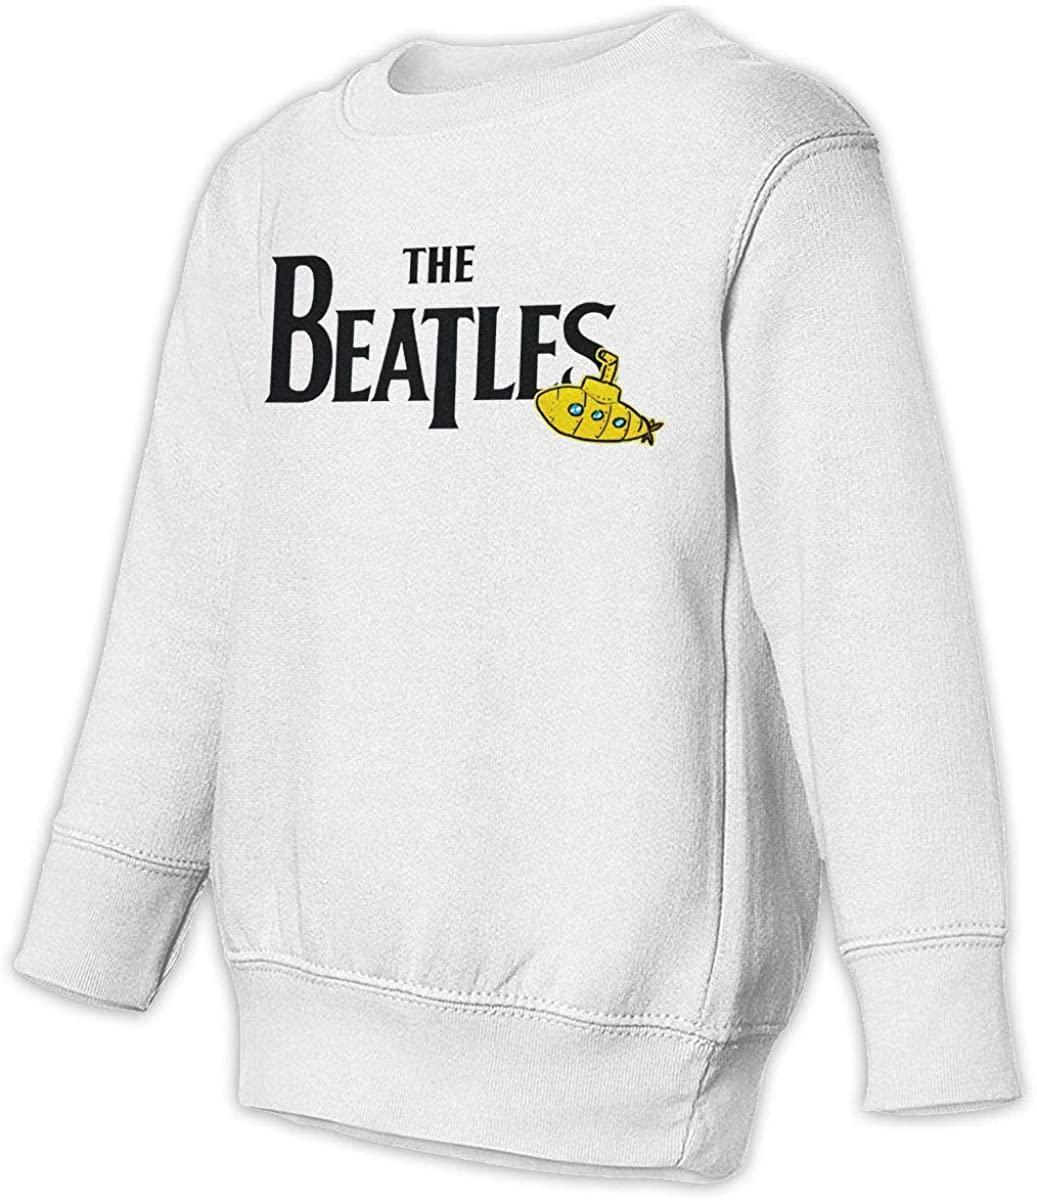 NOT Beatles Unisex Sweatshirt Youth Boy and Girls Pullover Sweatshirt White